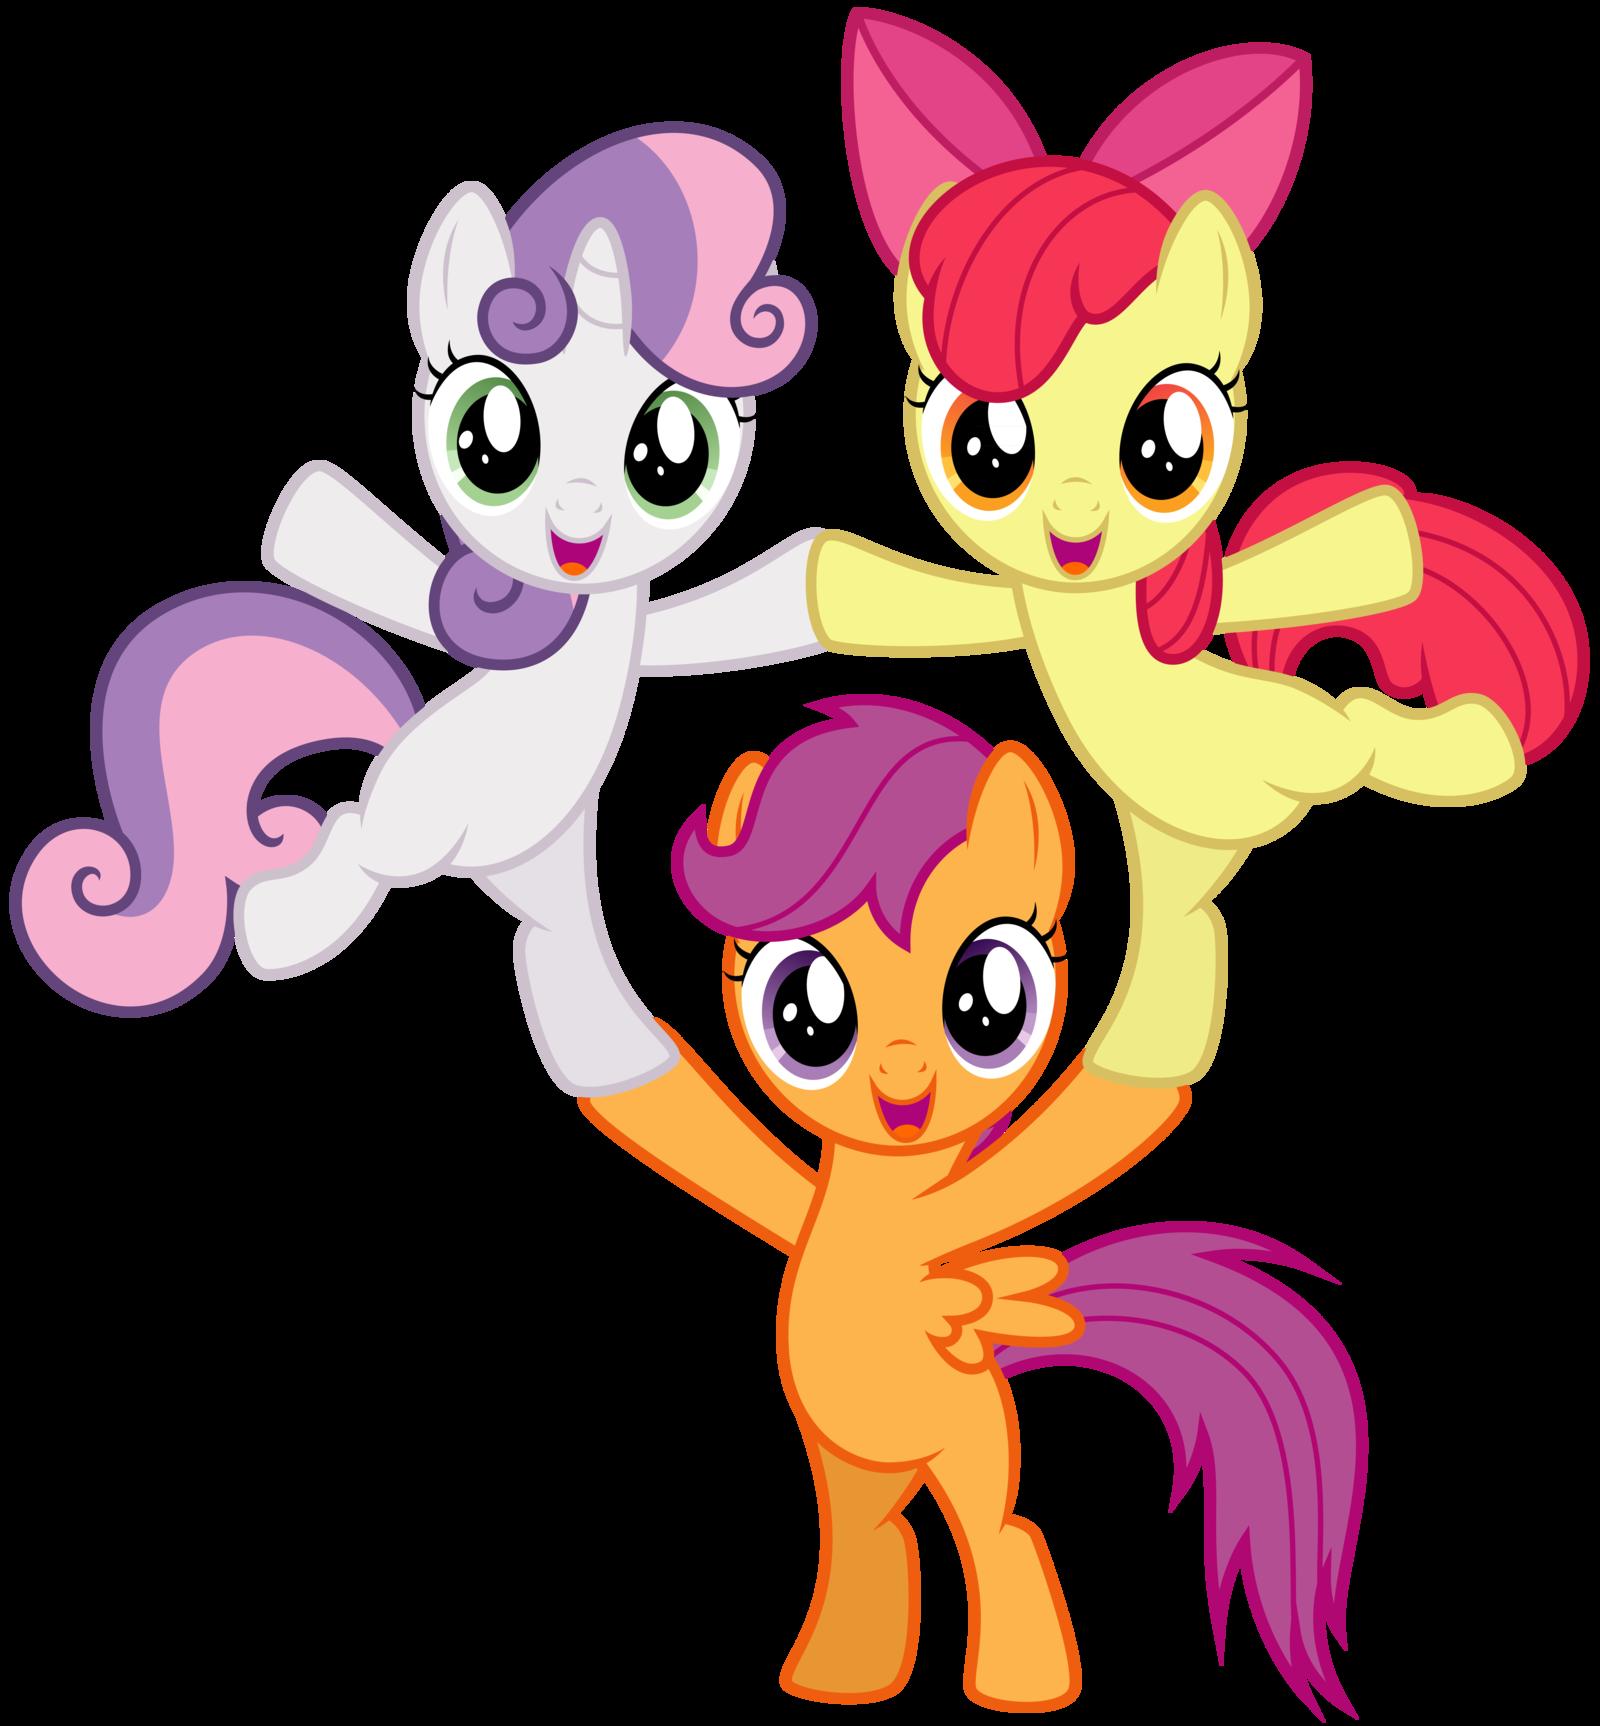 Картинка трех пони